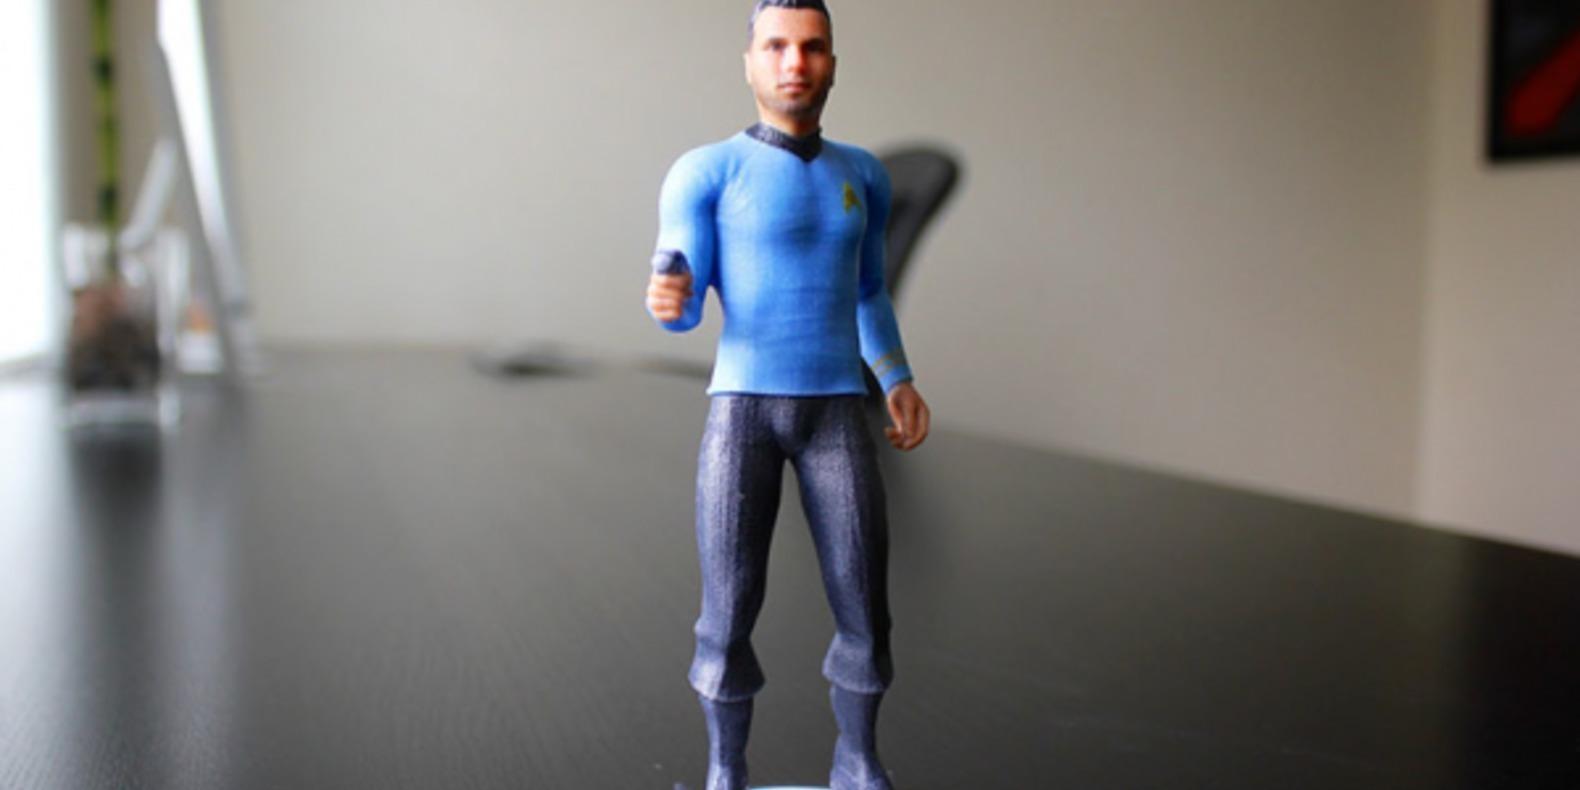 cubify 3D systems star trek 3DME impression 3D fugurines personnalisation cults fichier 3D 2